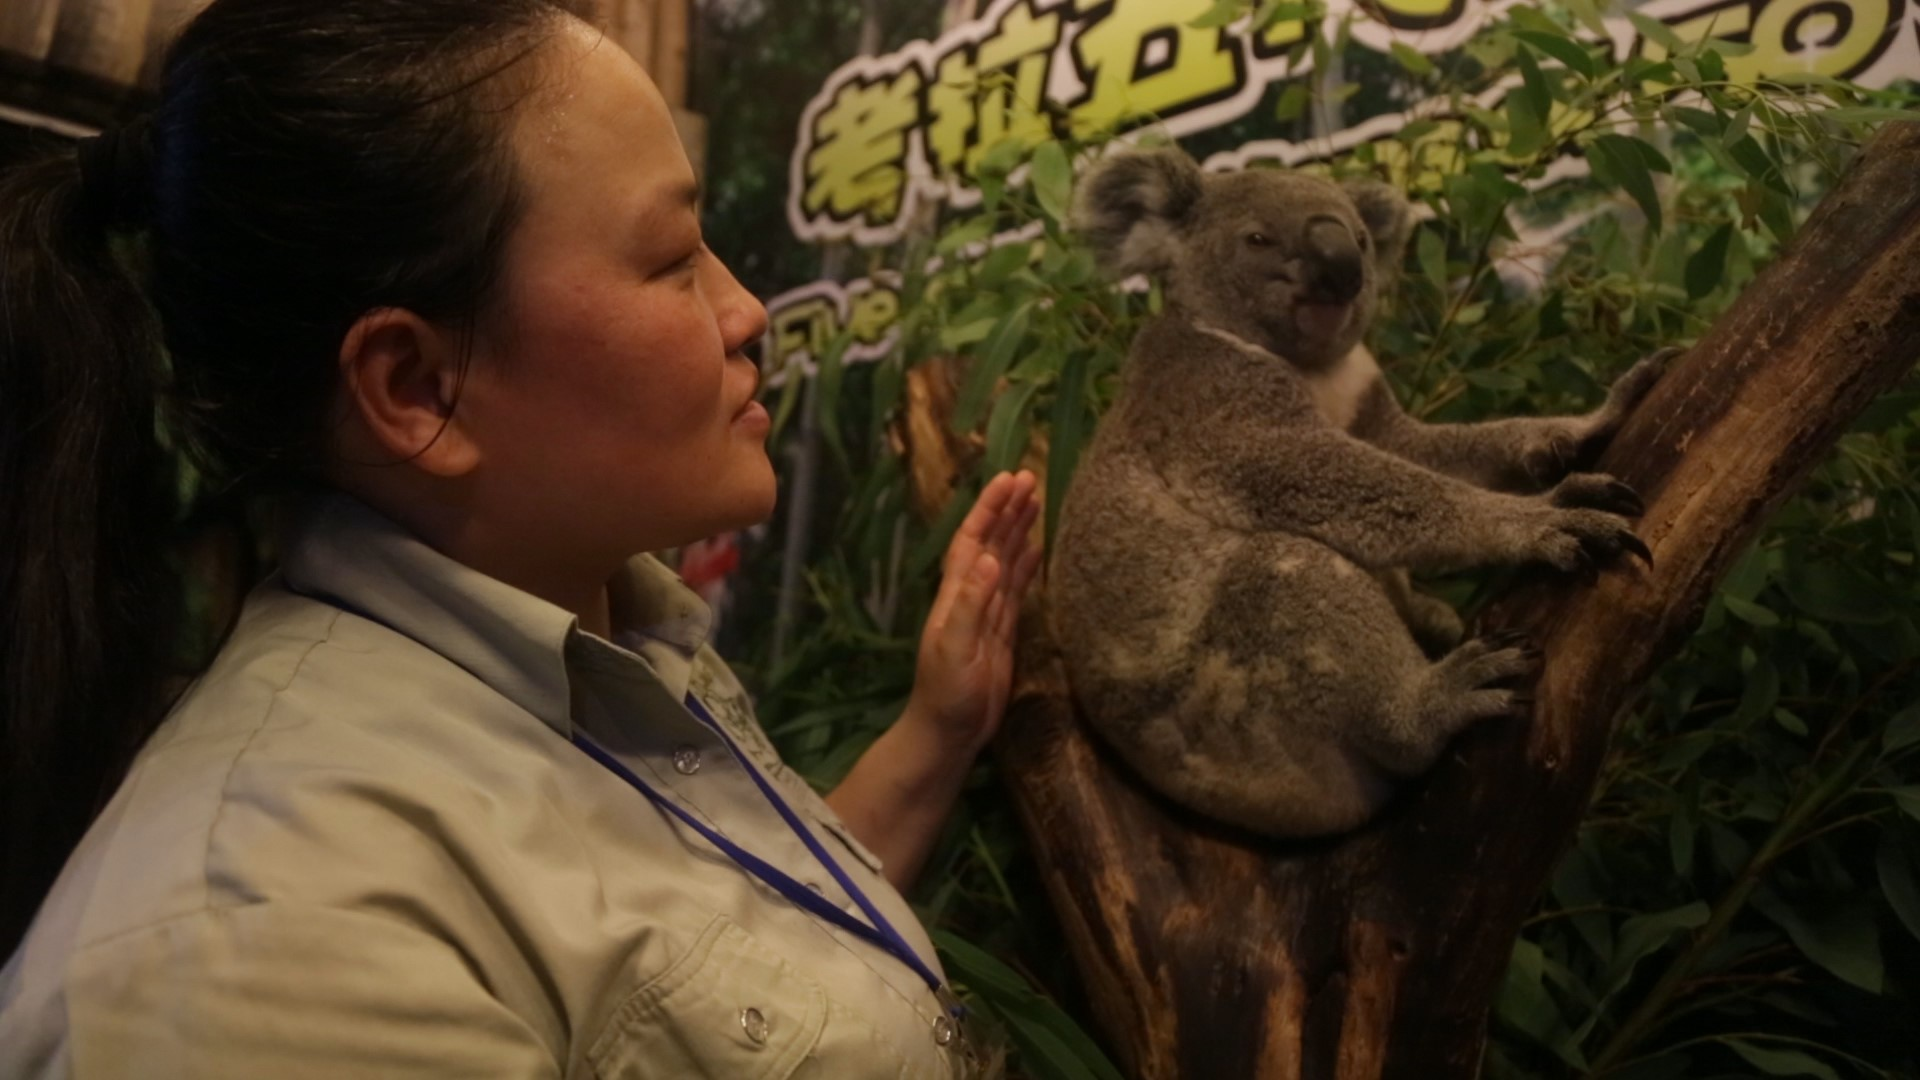 Koalas6